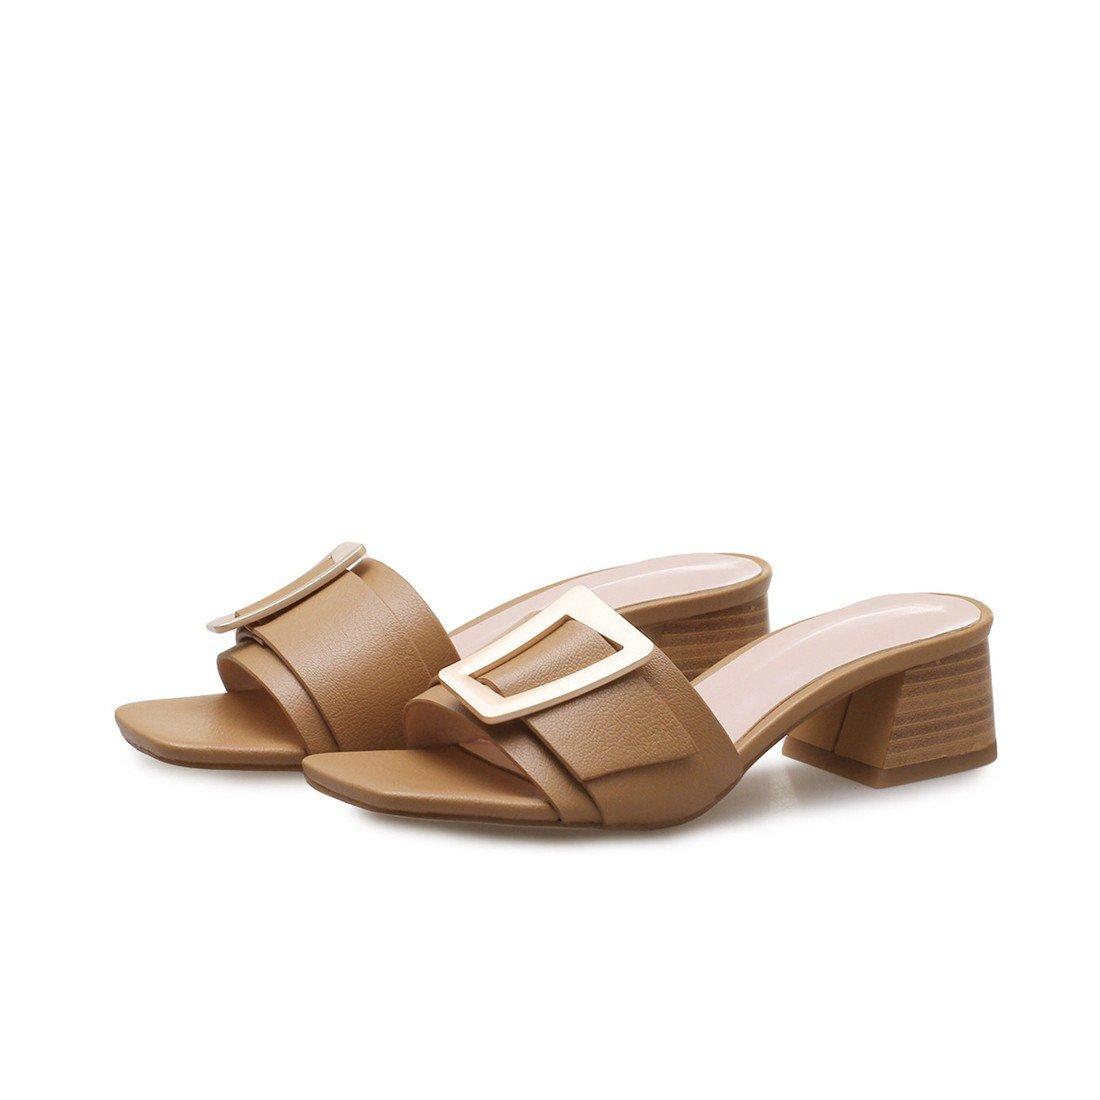 Damen Gürtel - Sandalen, Lässige Schuhe, Sandalen, Sandalen, Gürtel Damen Schlappen. Khaki fe2065